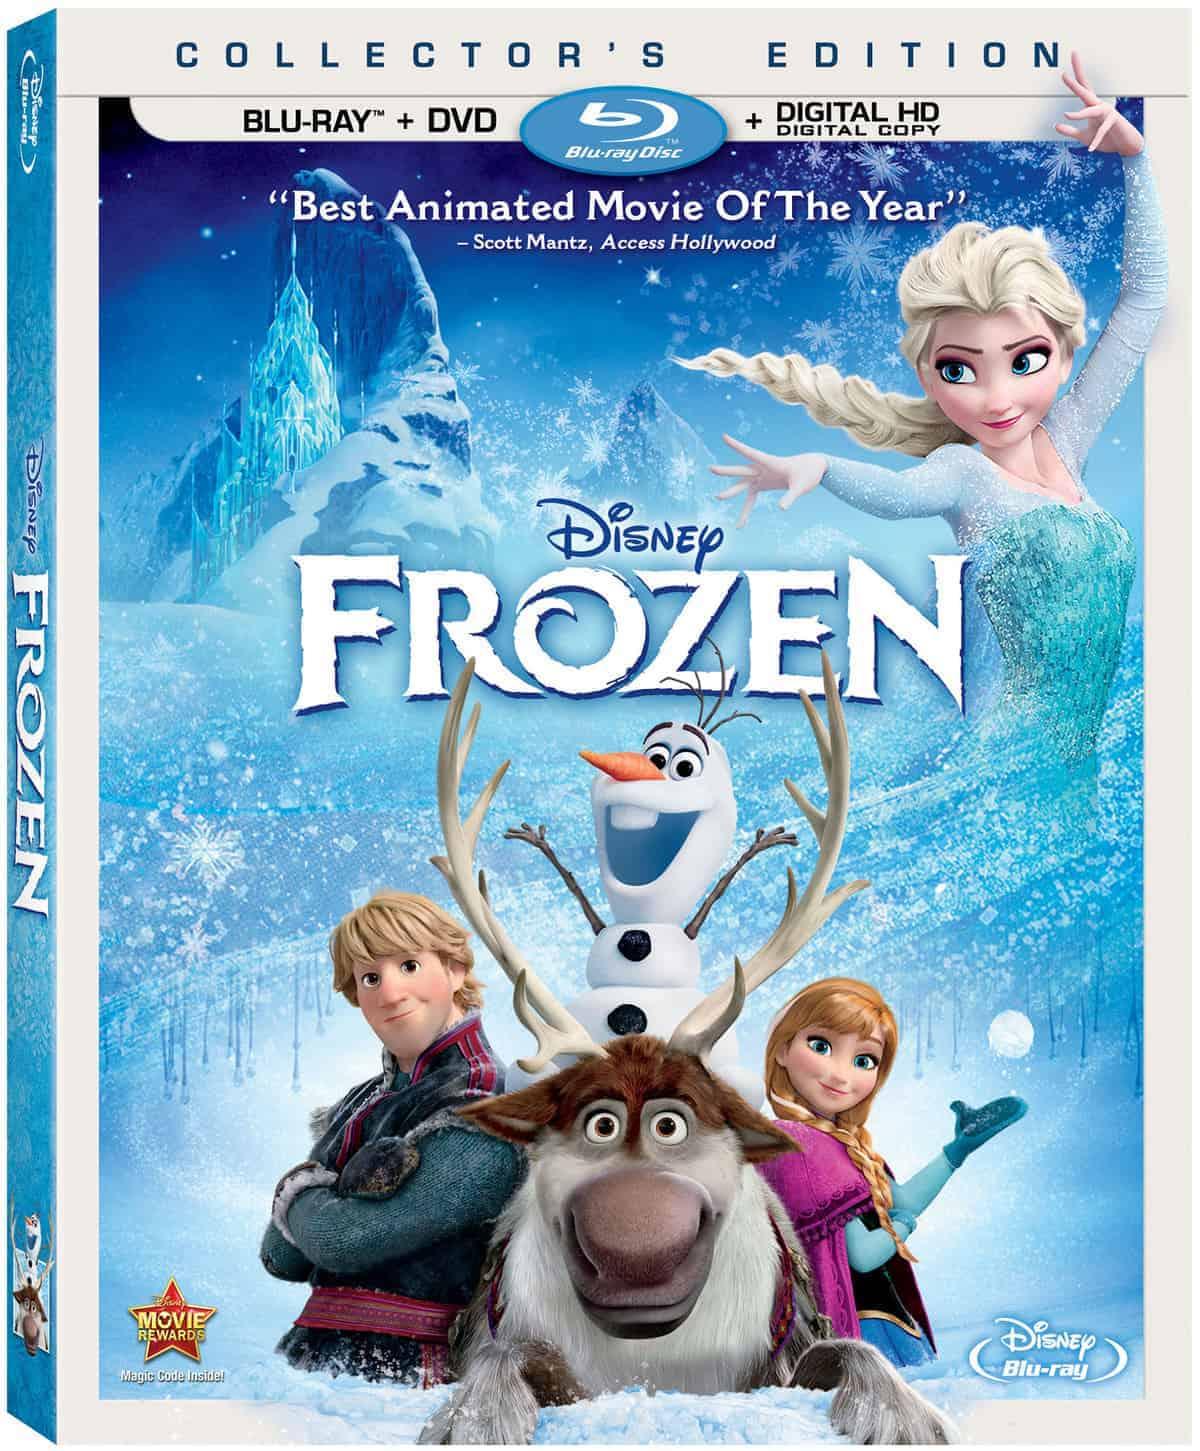 Disney's Frozen Blu-ray